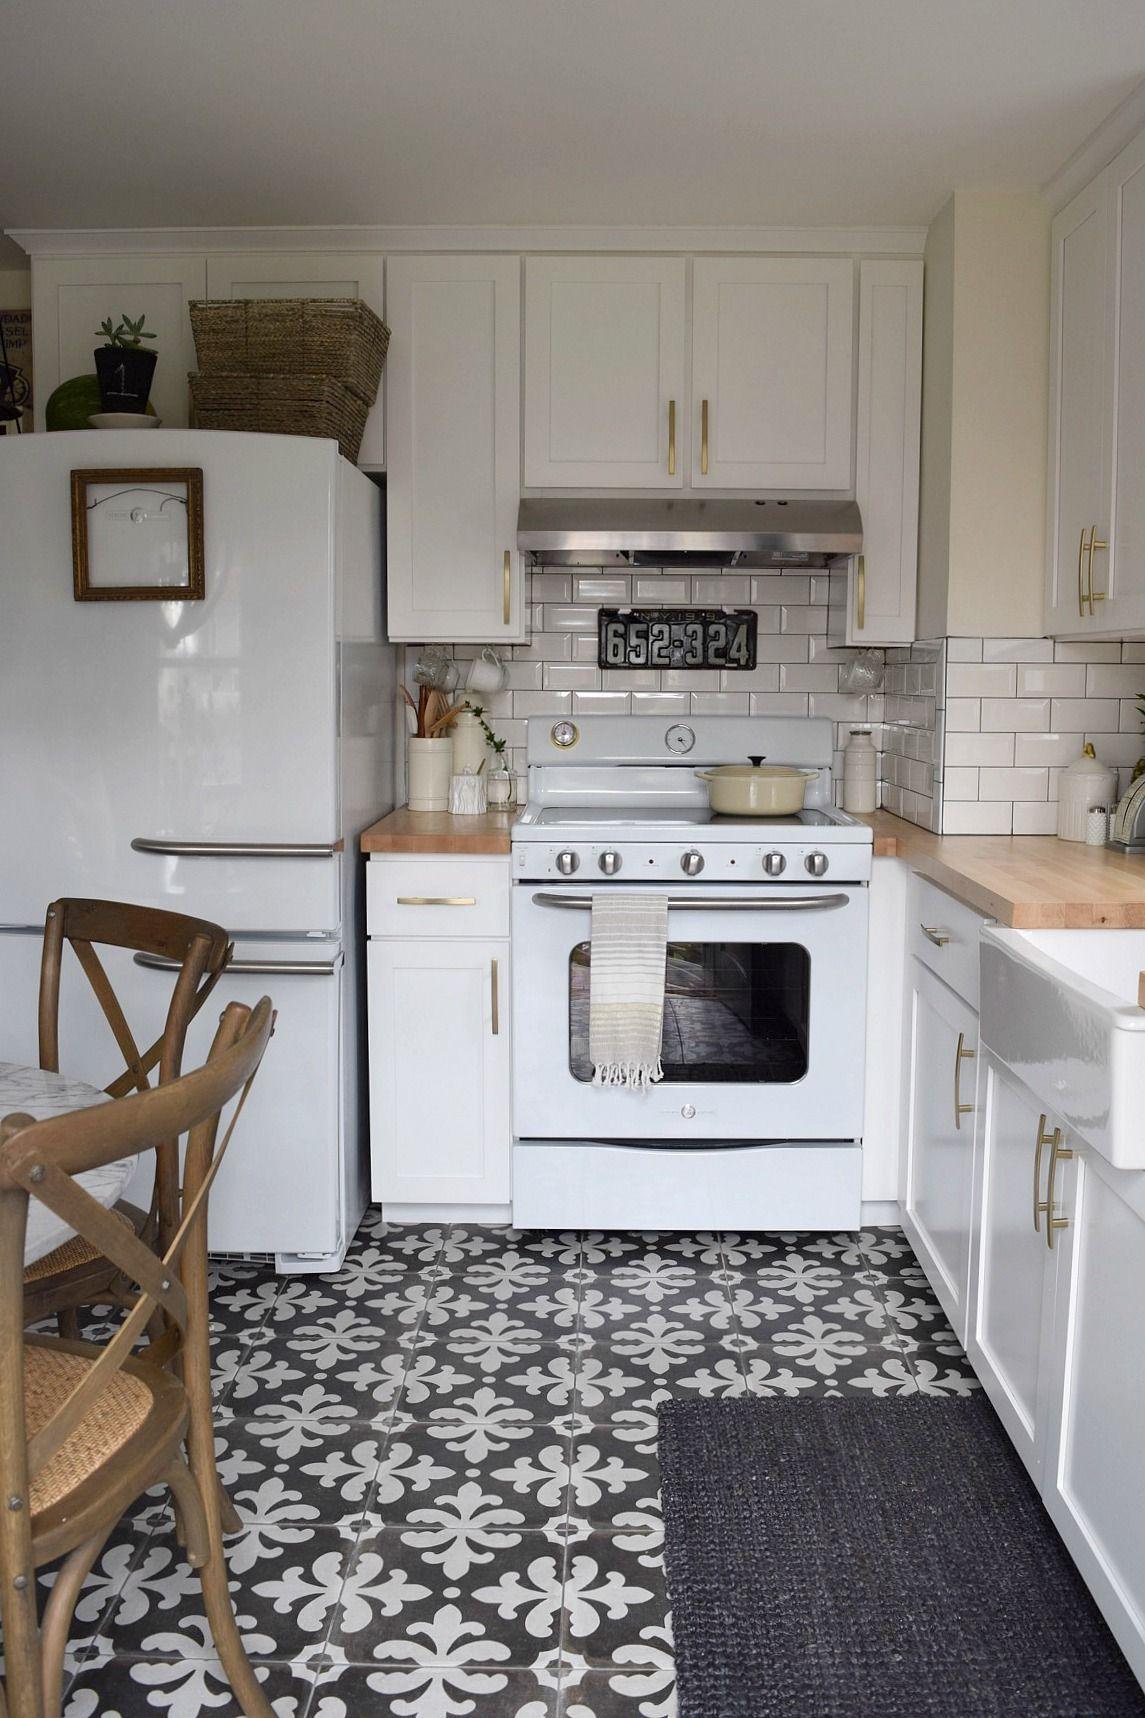 connecticut kitchen remodel retro kitchen appliances small space kitchen kitchen remodel on kitchen remodel appliances id=66579